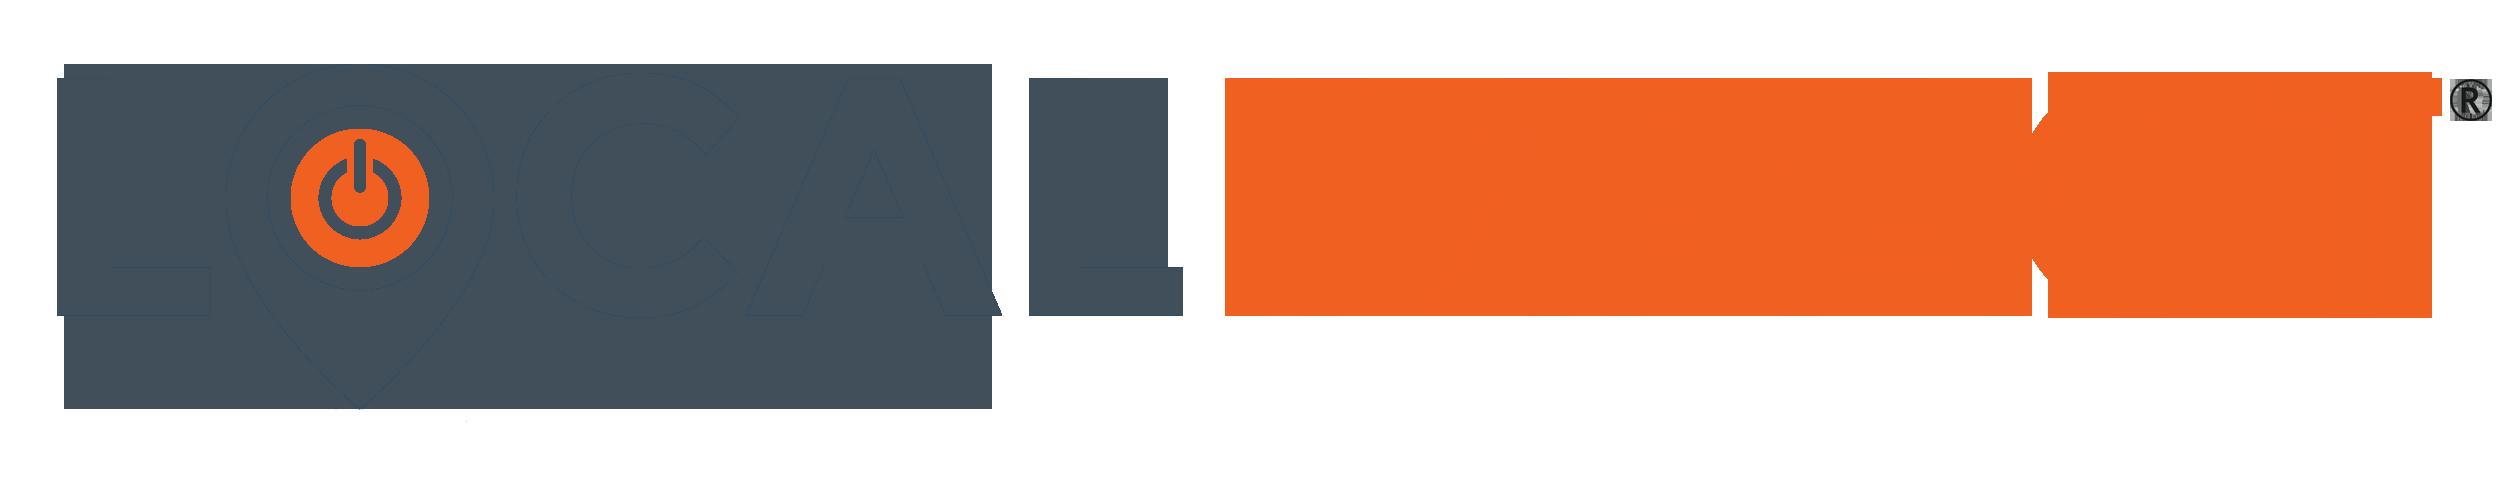 logo_2_transparent-No-Tagline.png